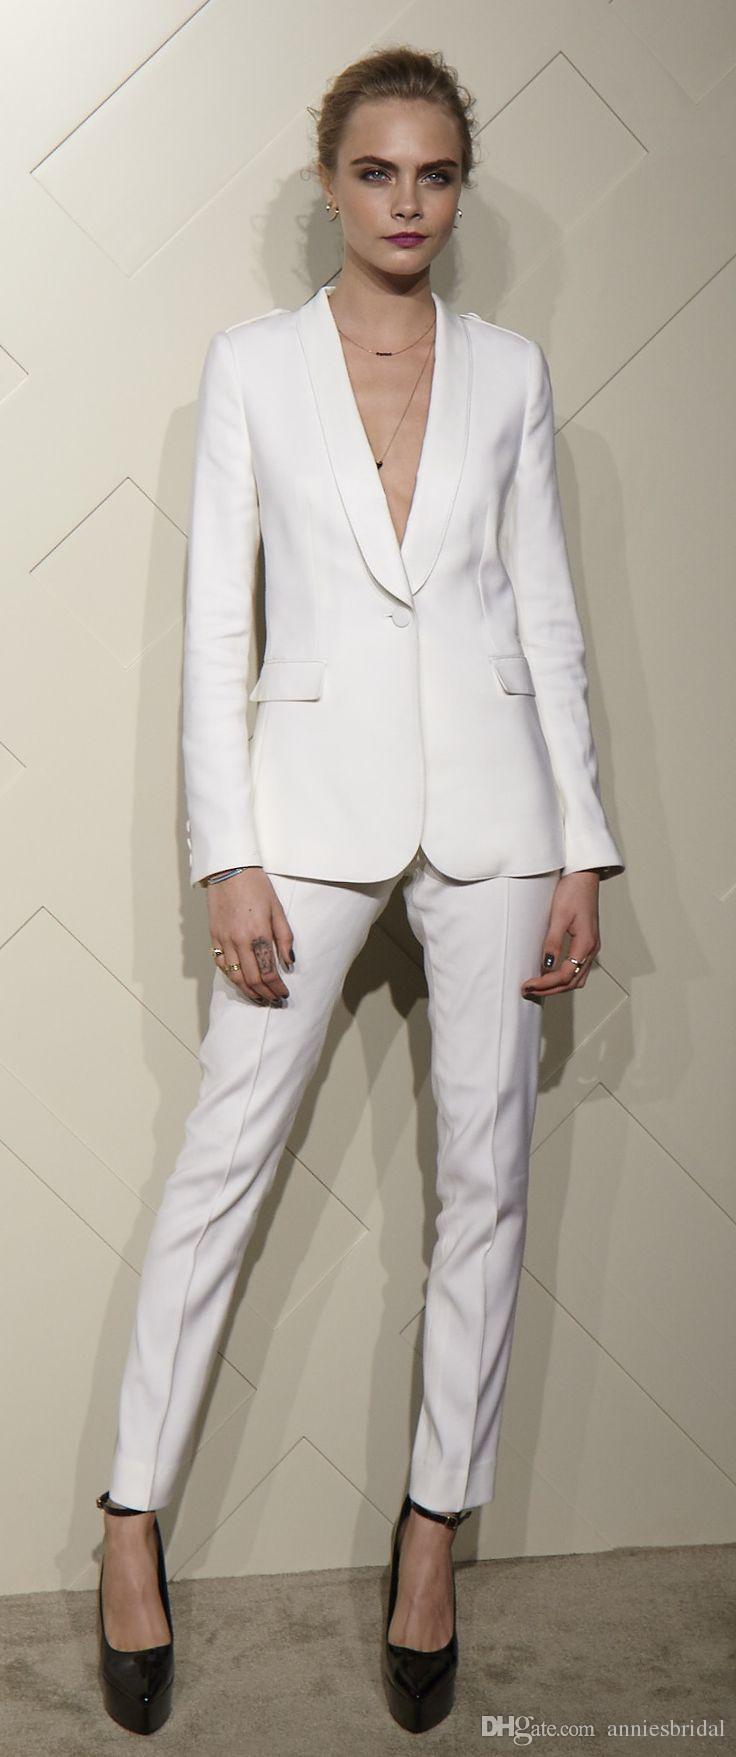 white suits for women wholesale - men suit mens complete designer tuxedo/bridegroom  (jacket+pant+tie+waistcoat) 1.best service with high quality NNNJQPL